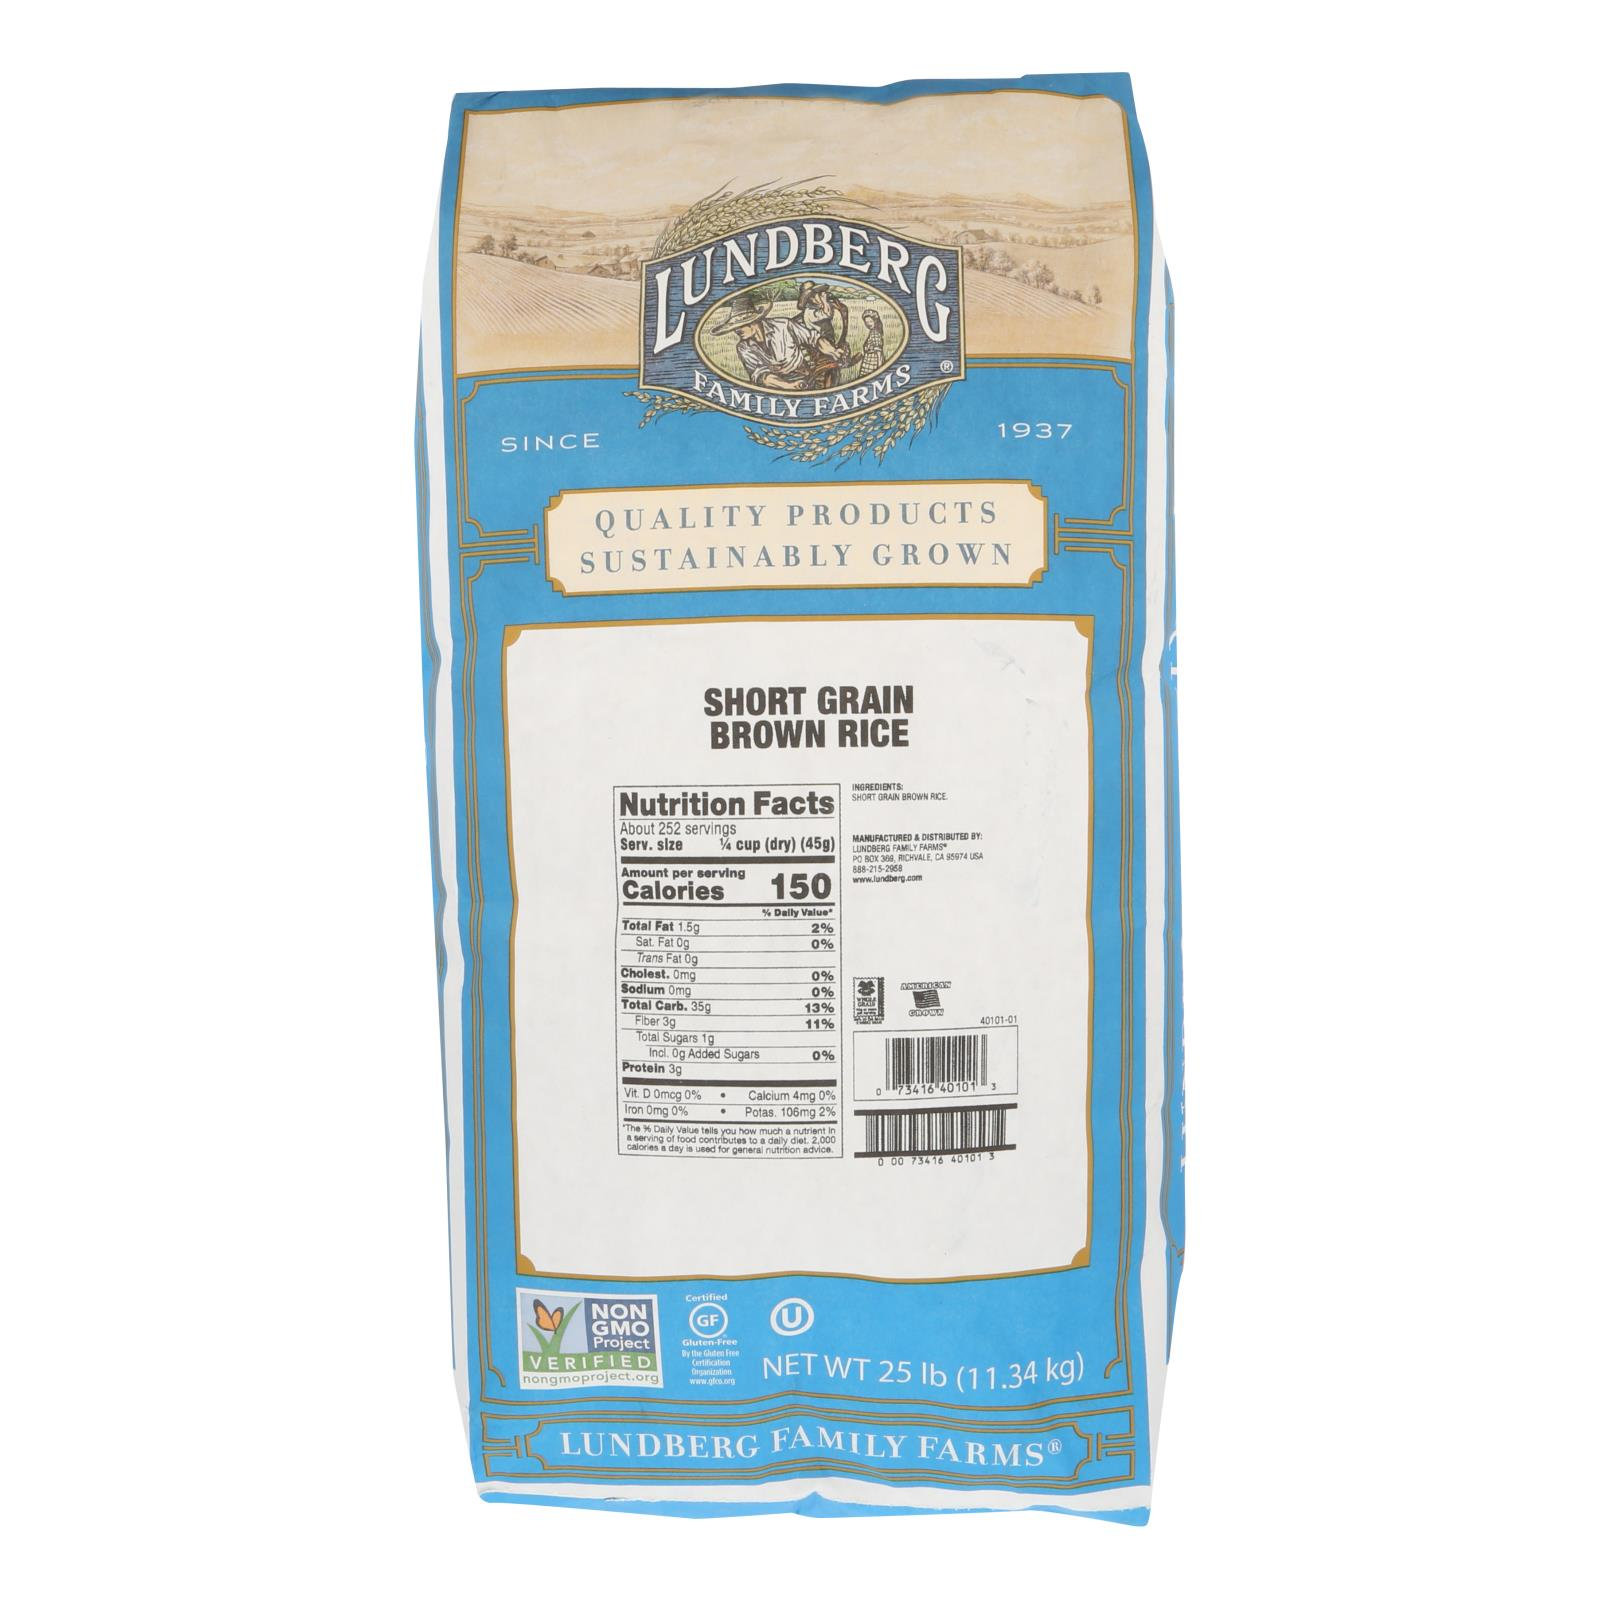 Lundberg Family Farms Brown Short Grain Rice - Case of 25 lbs %count(alt)